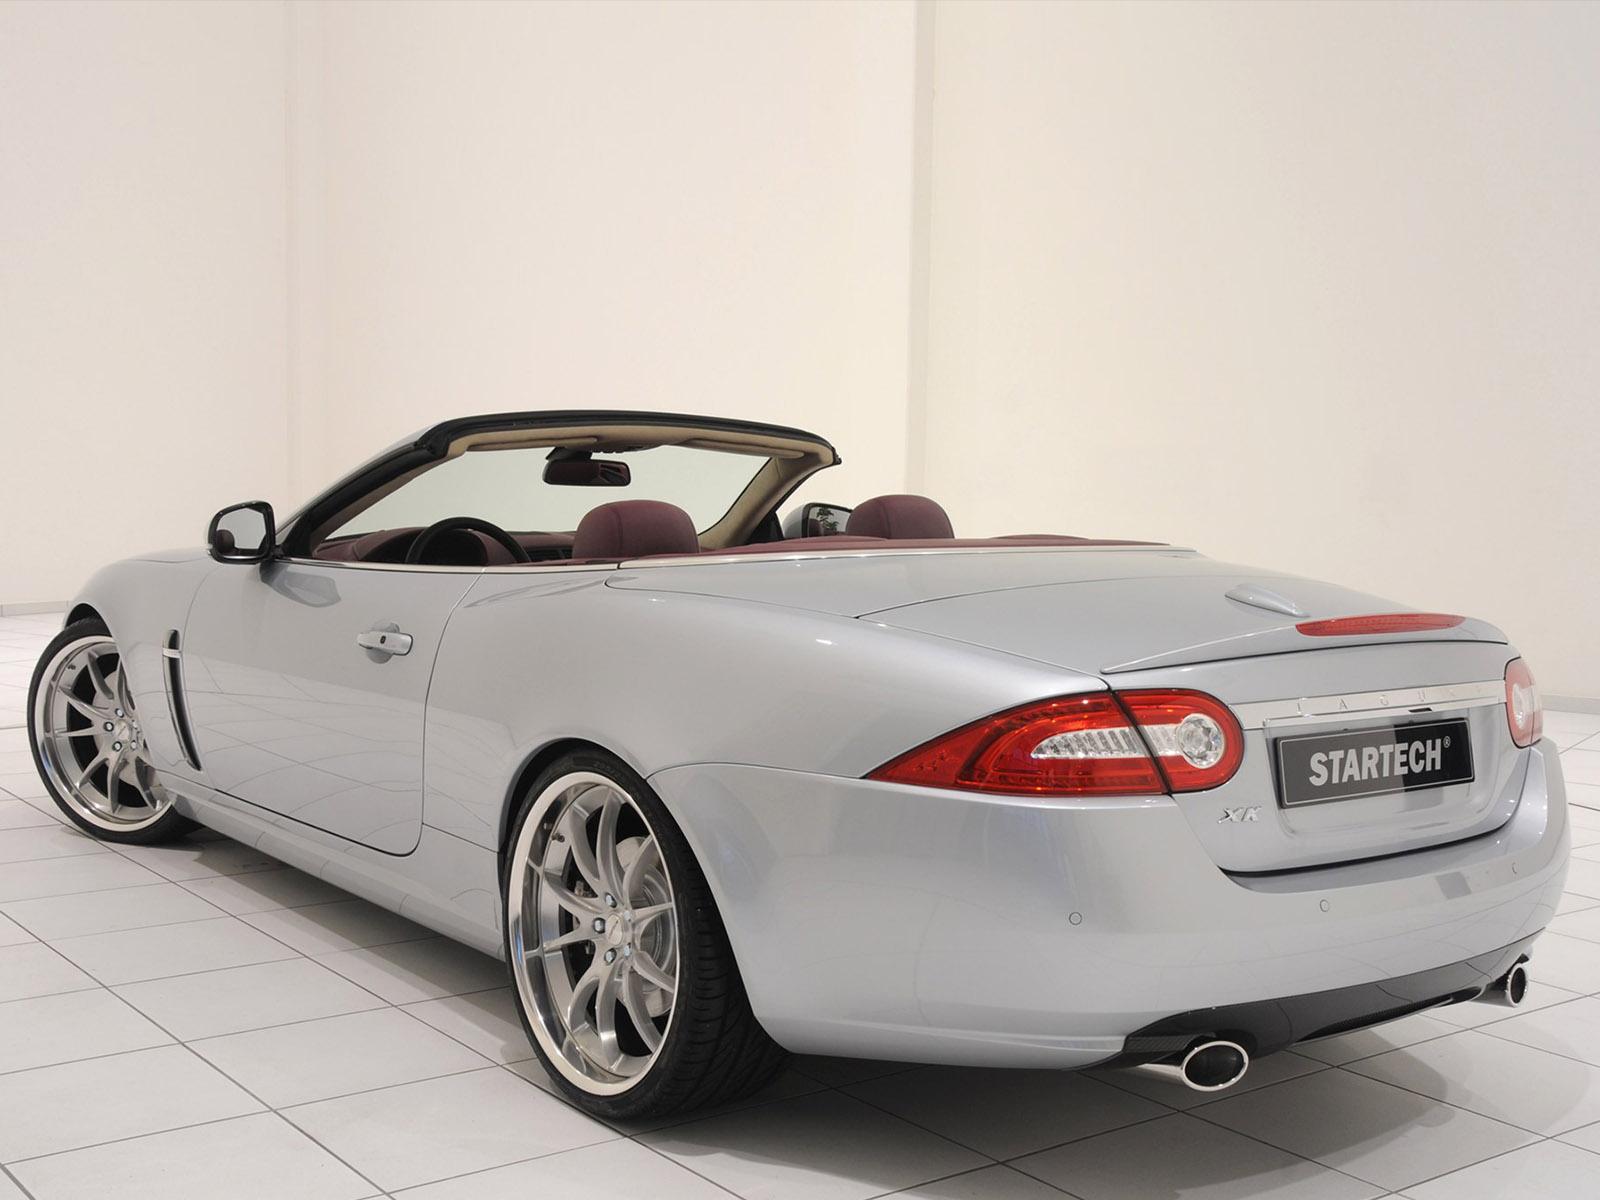 2010 Startech Jaguar XKR